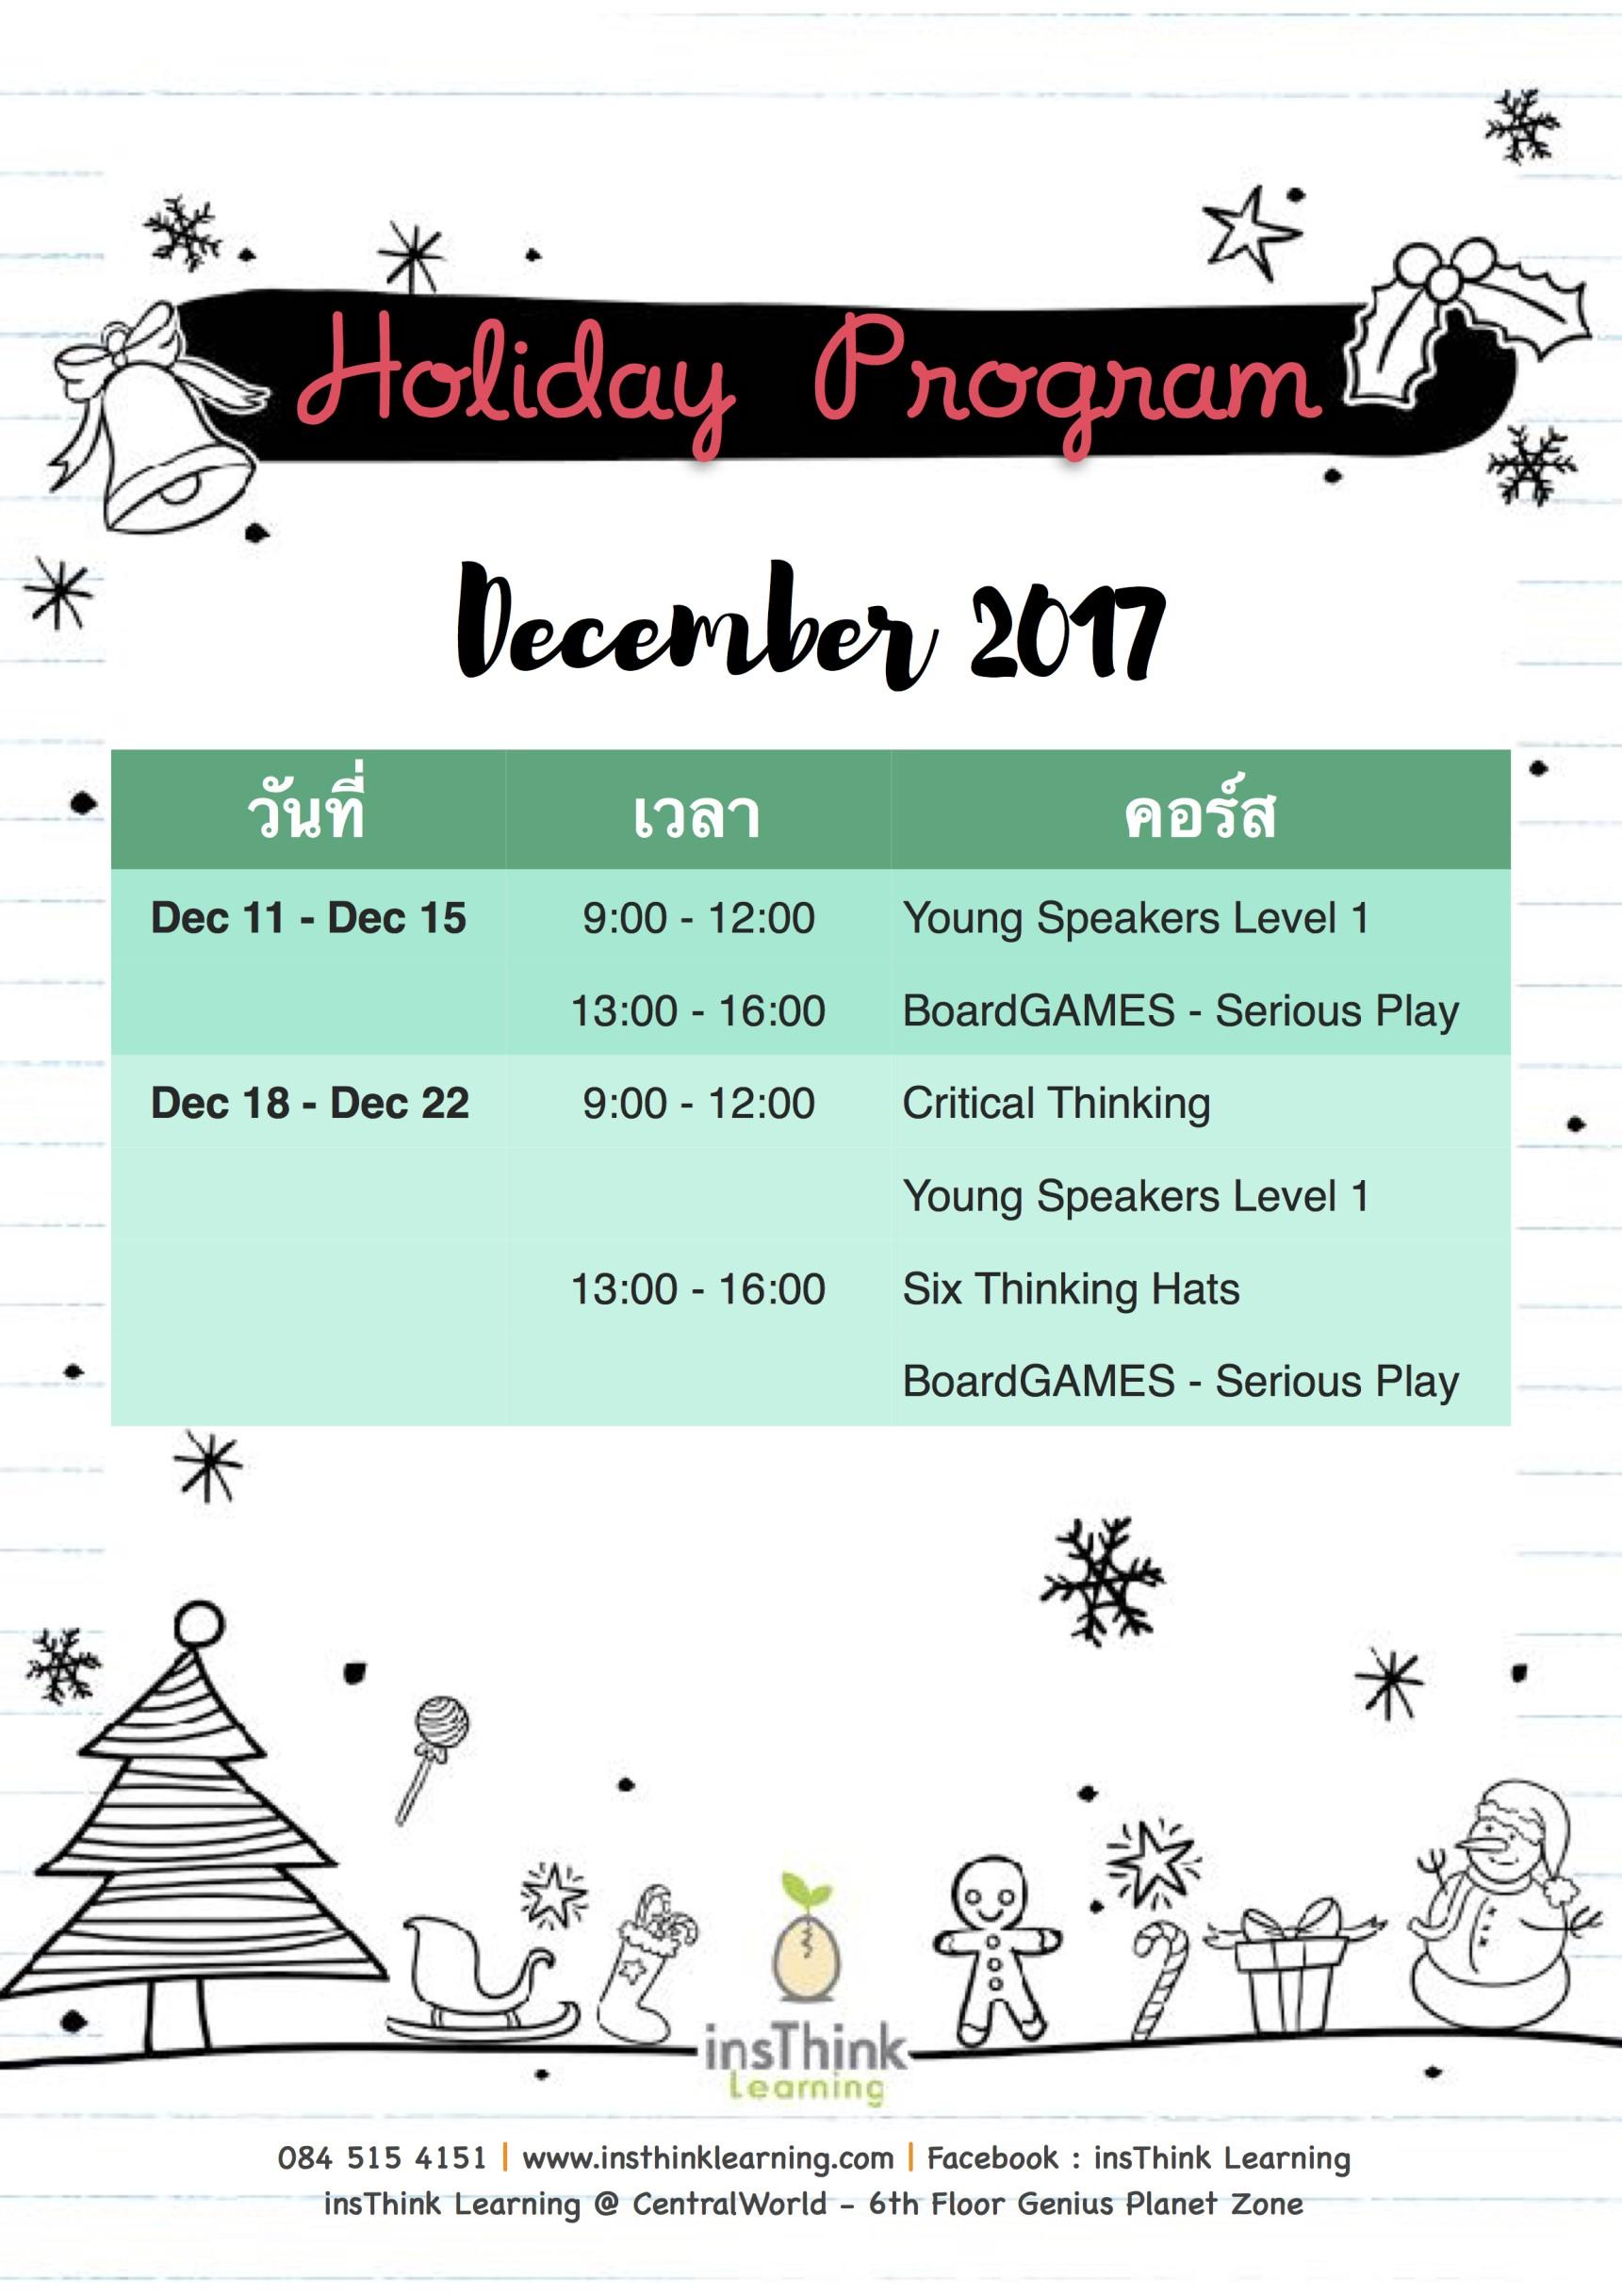 insThink Learning Holiday Program - December 2017 ตารางเรียนอินสติ๊งค์ เลิร์นนิ่ง ธันวาคม 2560